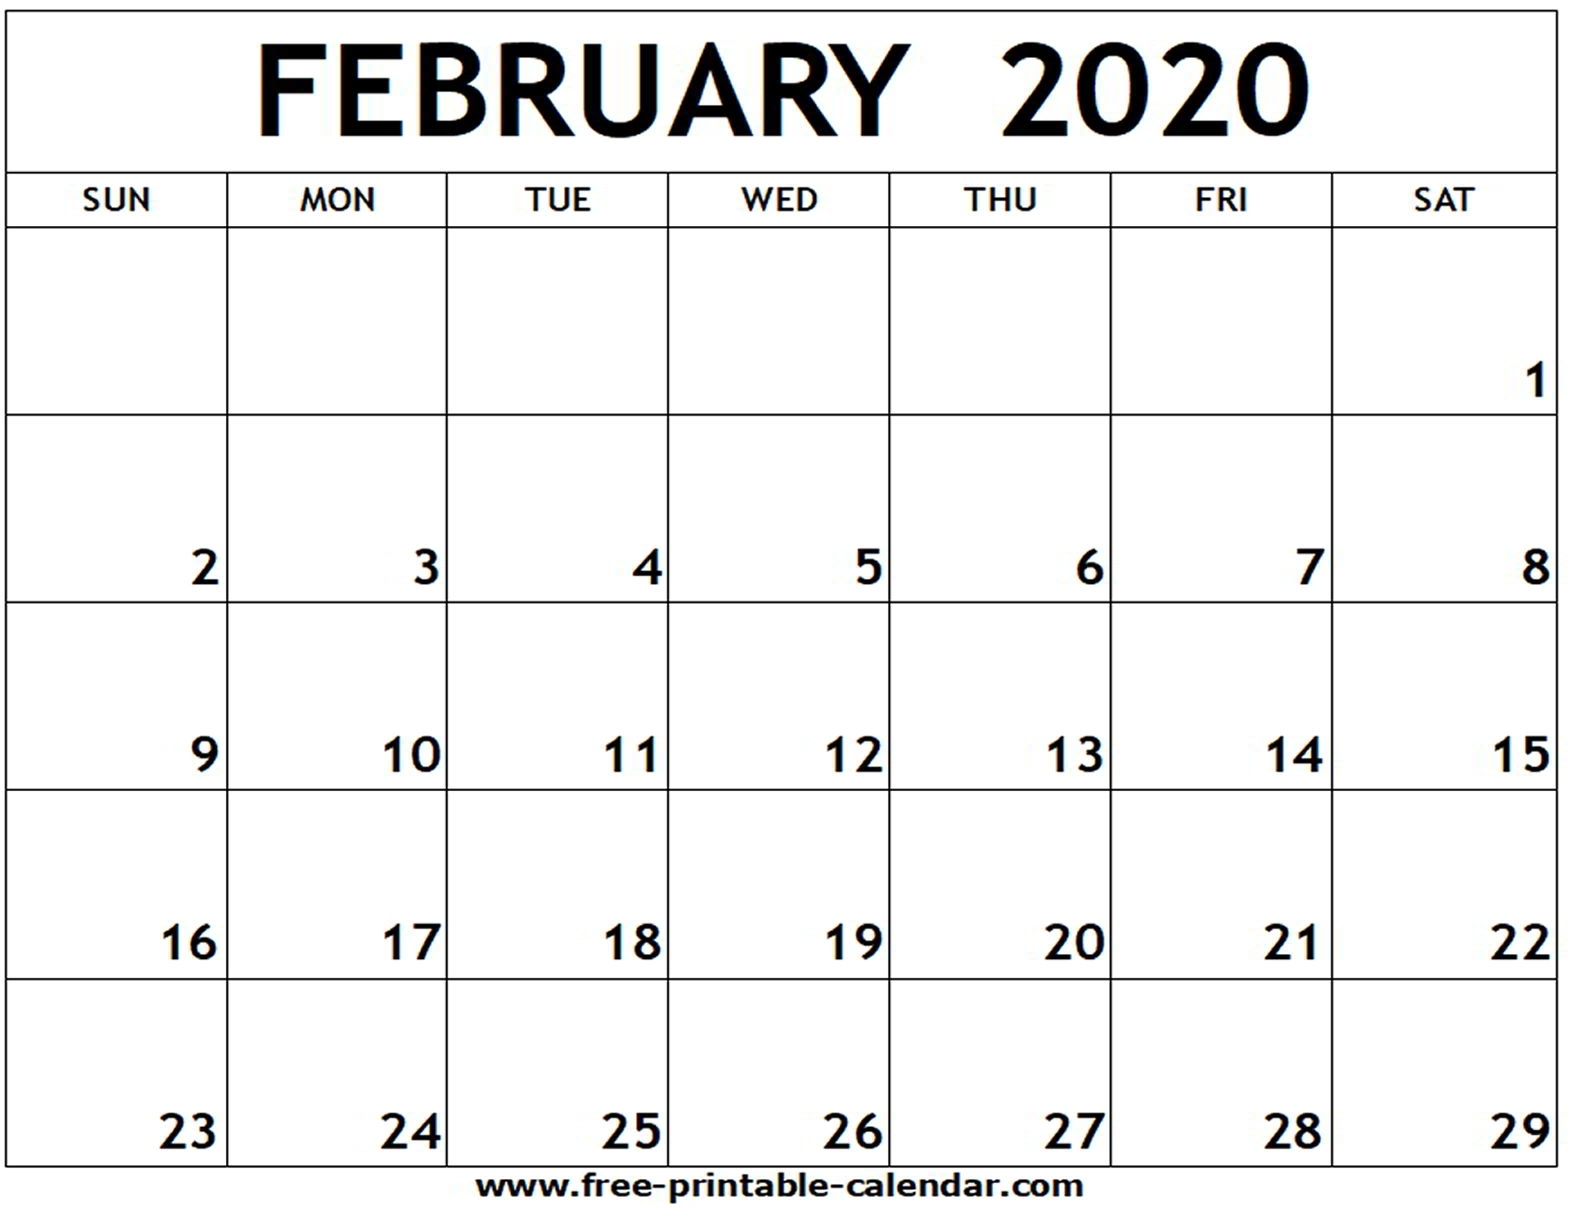 February 2020 Printable Calendar - Free-Printable-Calendar intended for Printable Fill In Calendar 2020